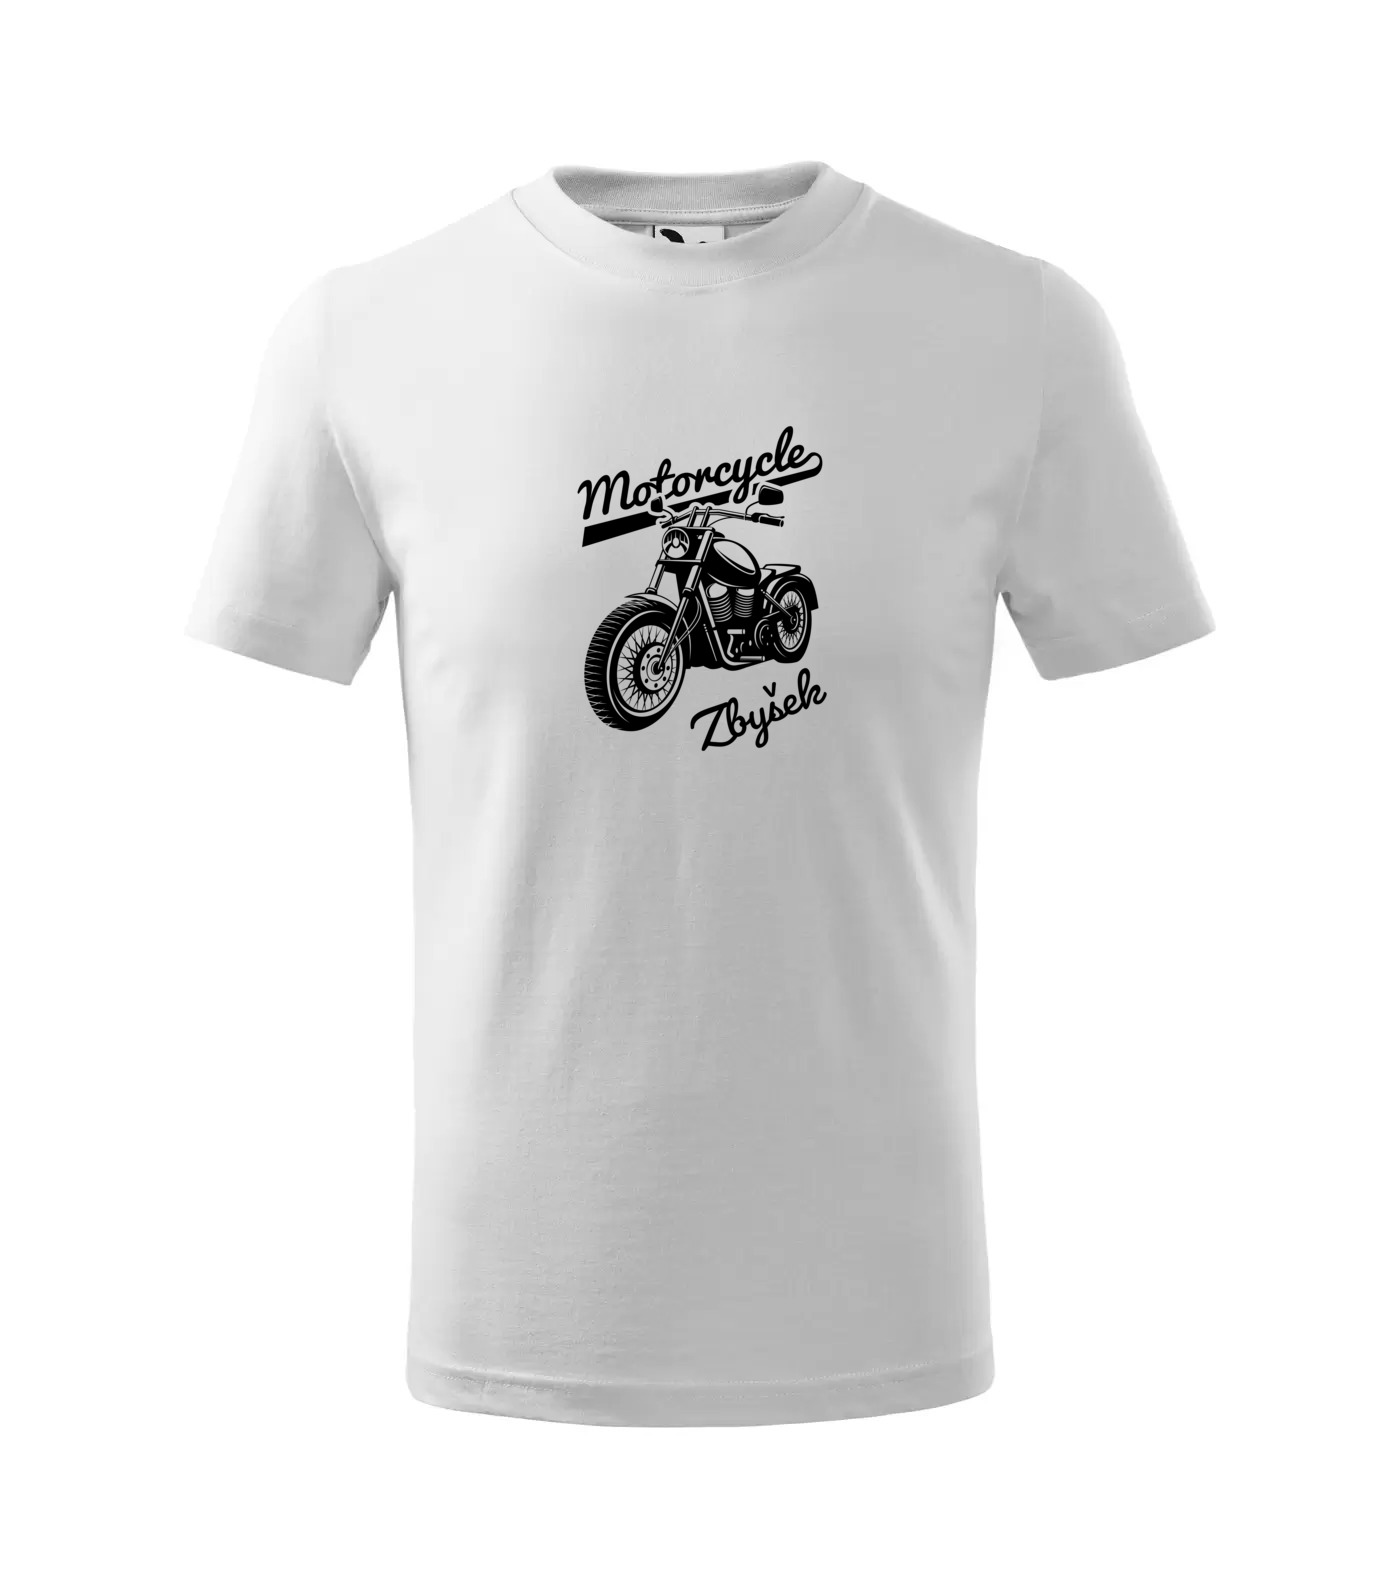 Tričko Motorkář Inverse Zbyšek